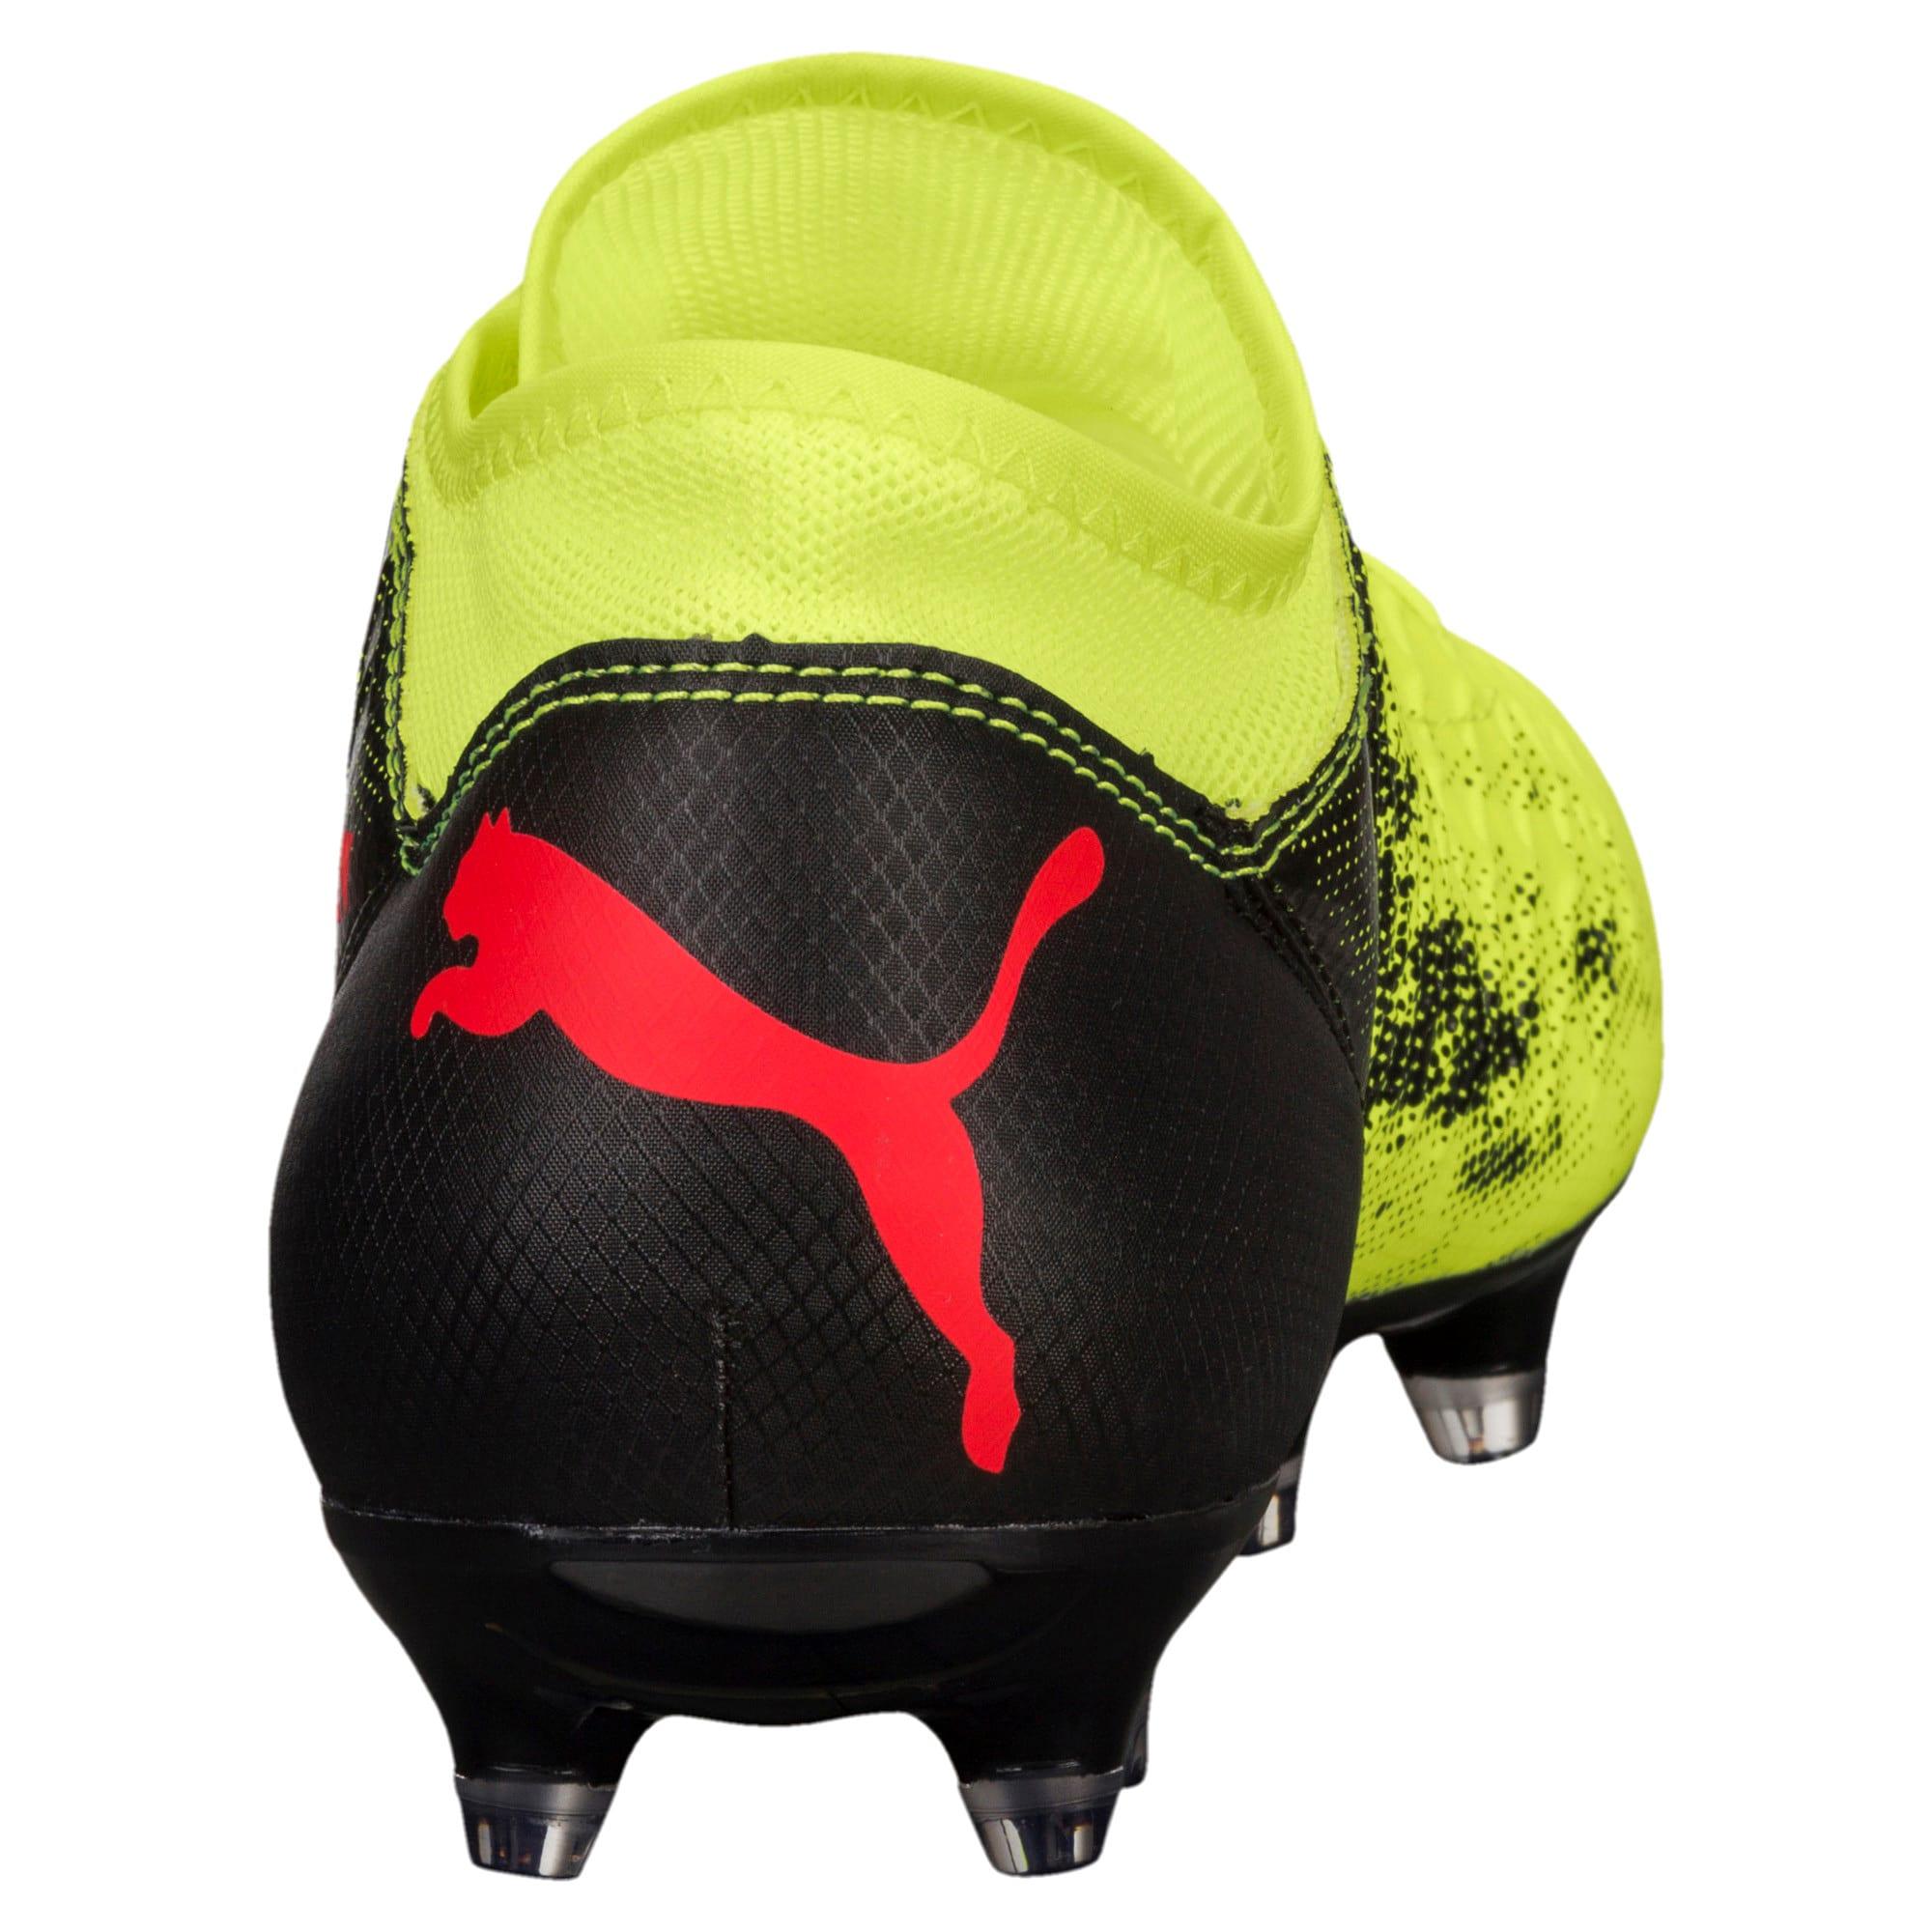 Thumbnail 3 of FUTURE 18.4 FG/AG Jr Football Boots, Yellow-Red-Black, medium-IND